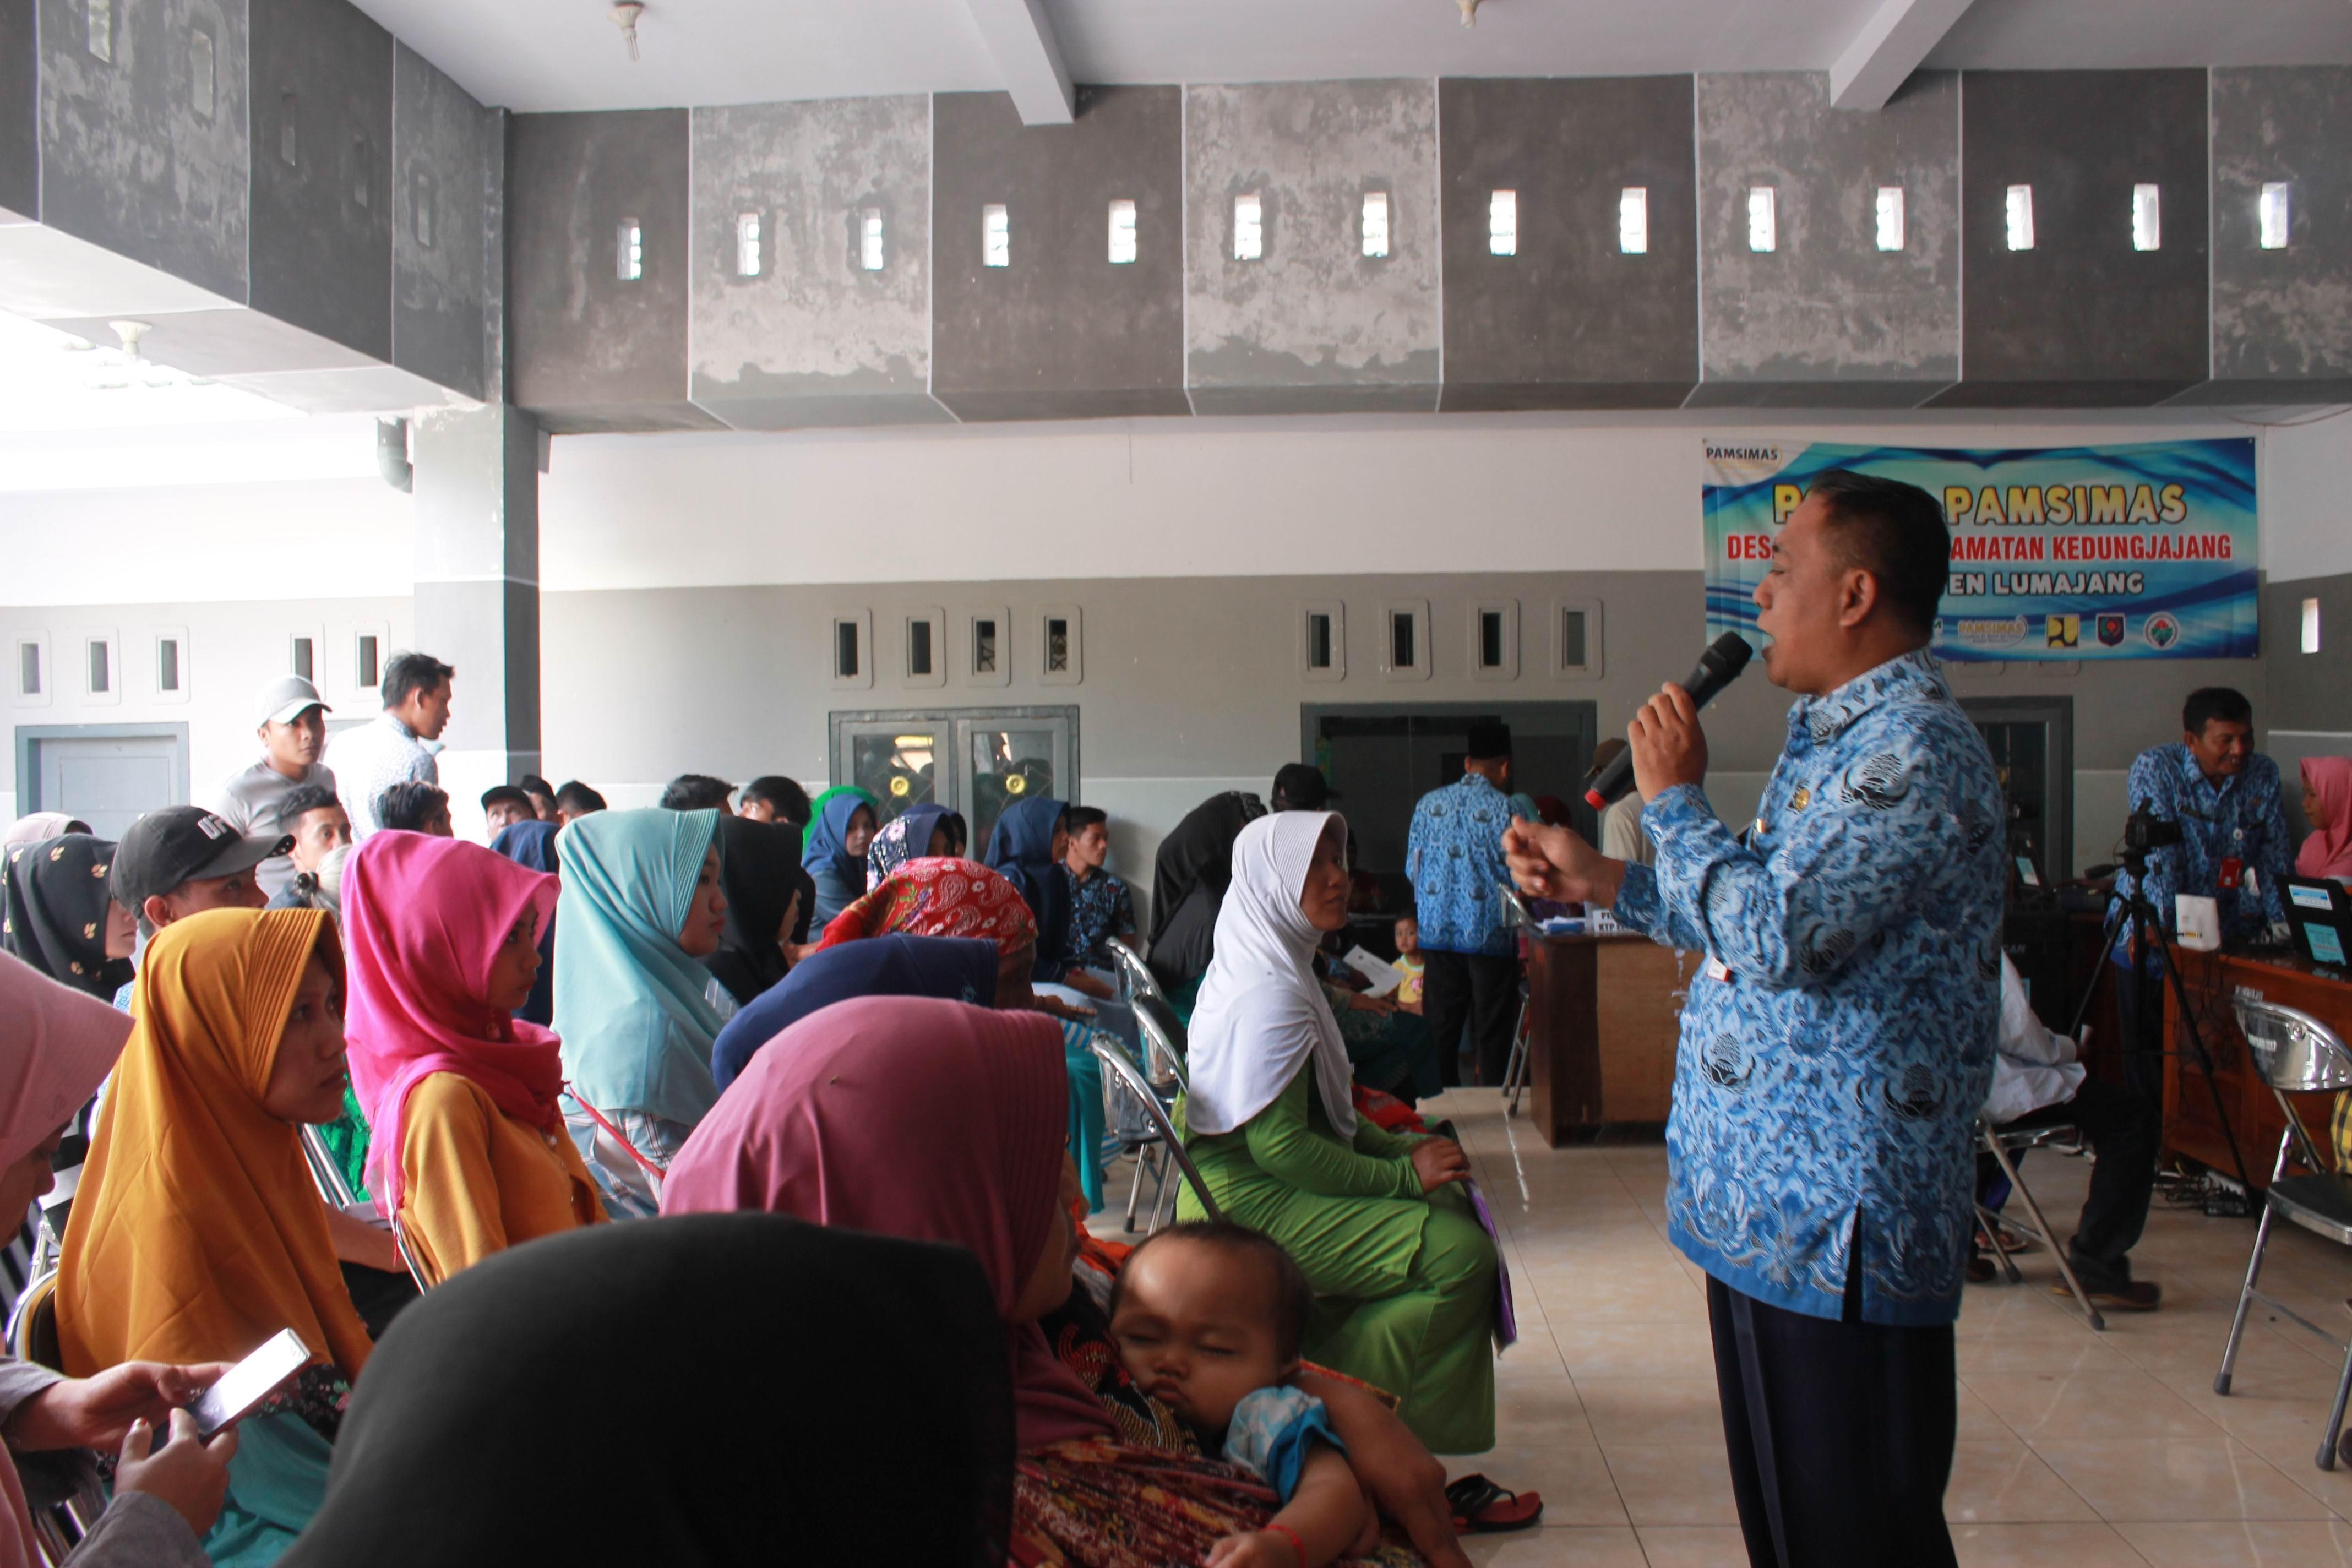 Roadshow Pelayanan Adminduk Hari Ke-1 : Desa Jatisari Kecamatan Kedungjajang